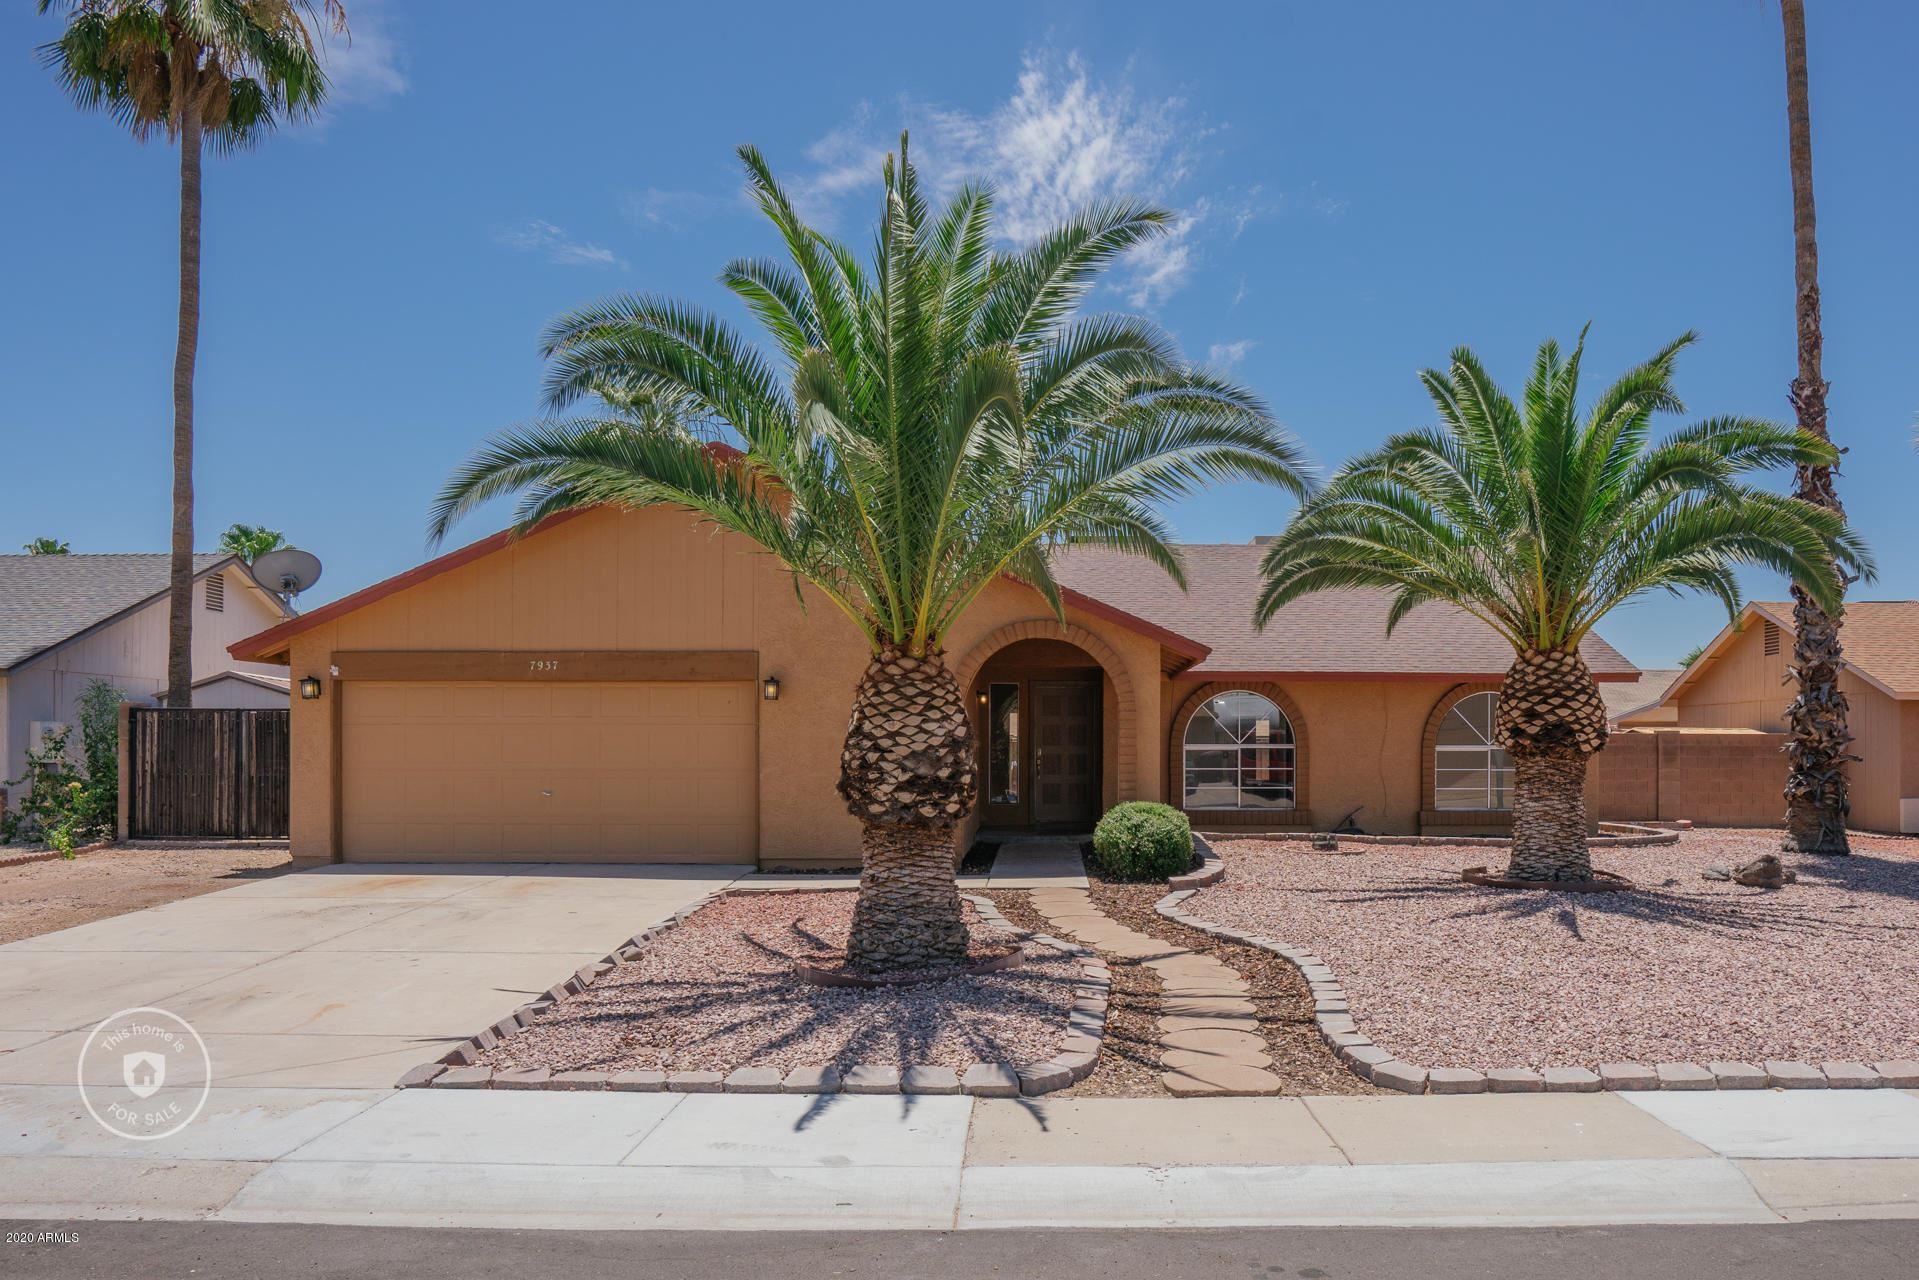 7937 W ASTER Drive, Peoria, AZ 85381 - #: 6096315